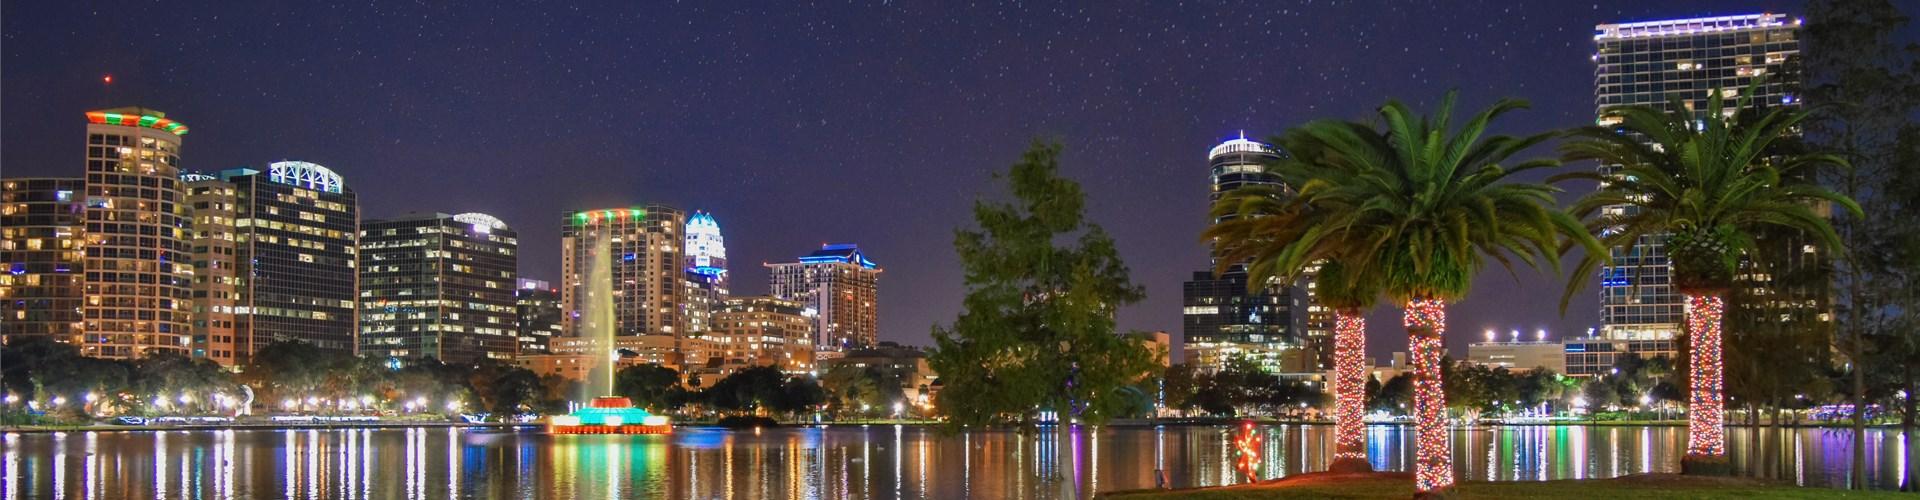 Downtown Orlando from Lake Eola Park at dusk